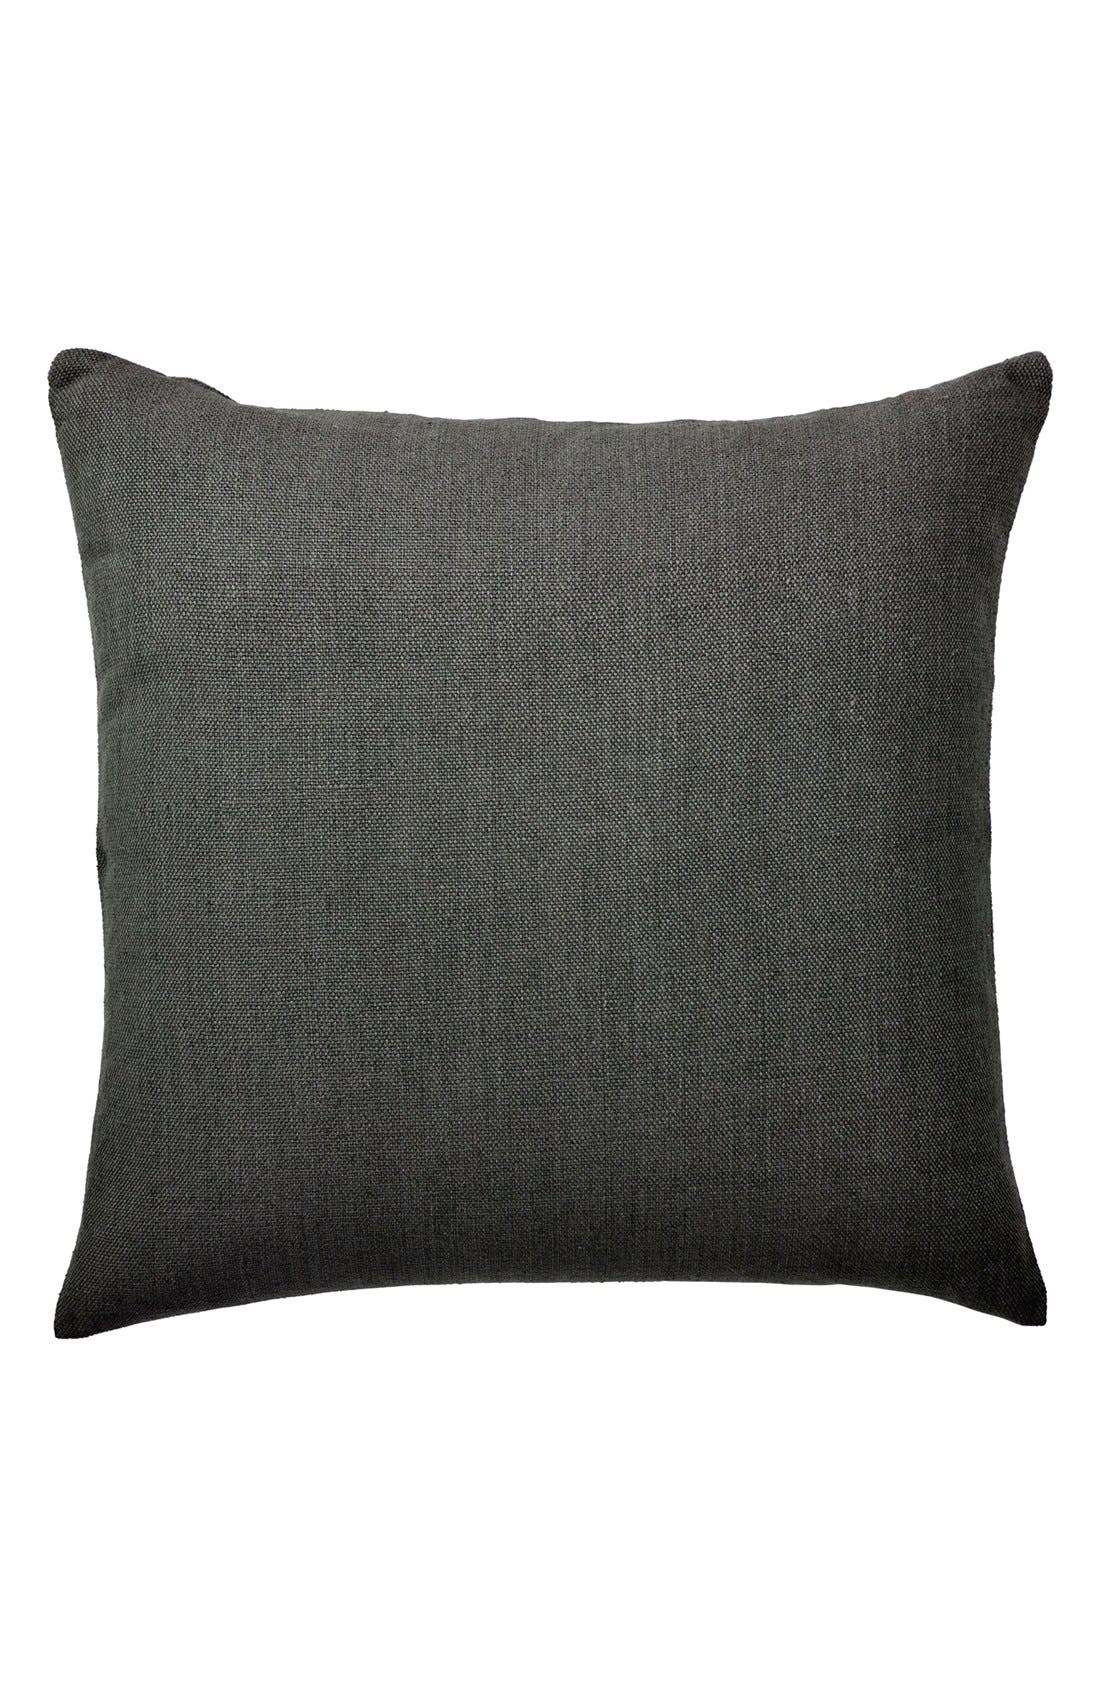 Main Image - Donna Karan 'Blooms' Euro Pillow Sham (Online Only)